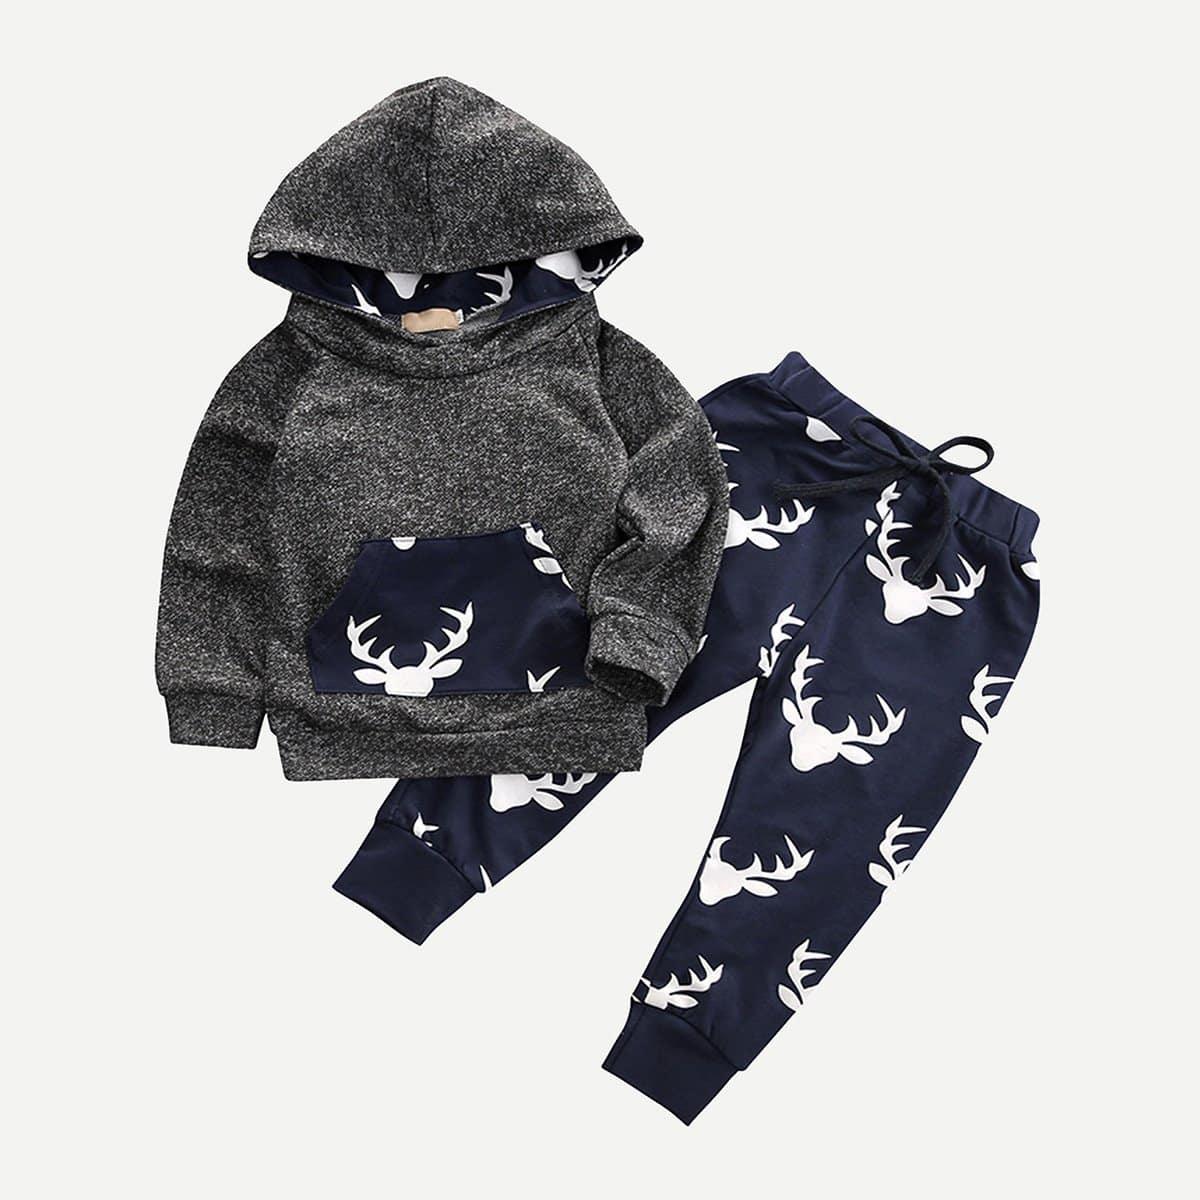 Hoodie met kangoeroezak en broek met hertprint pyjama set